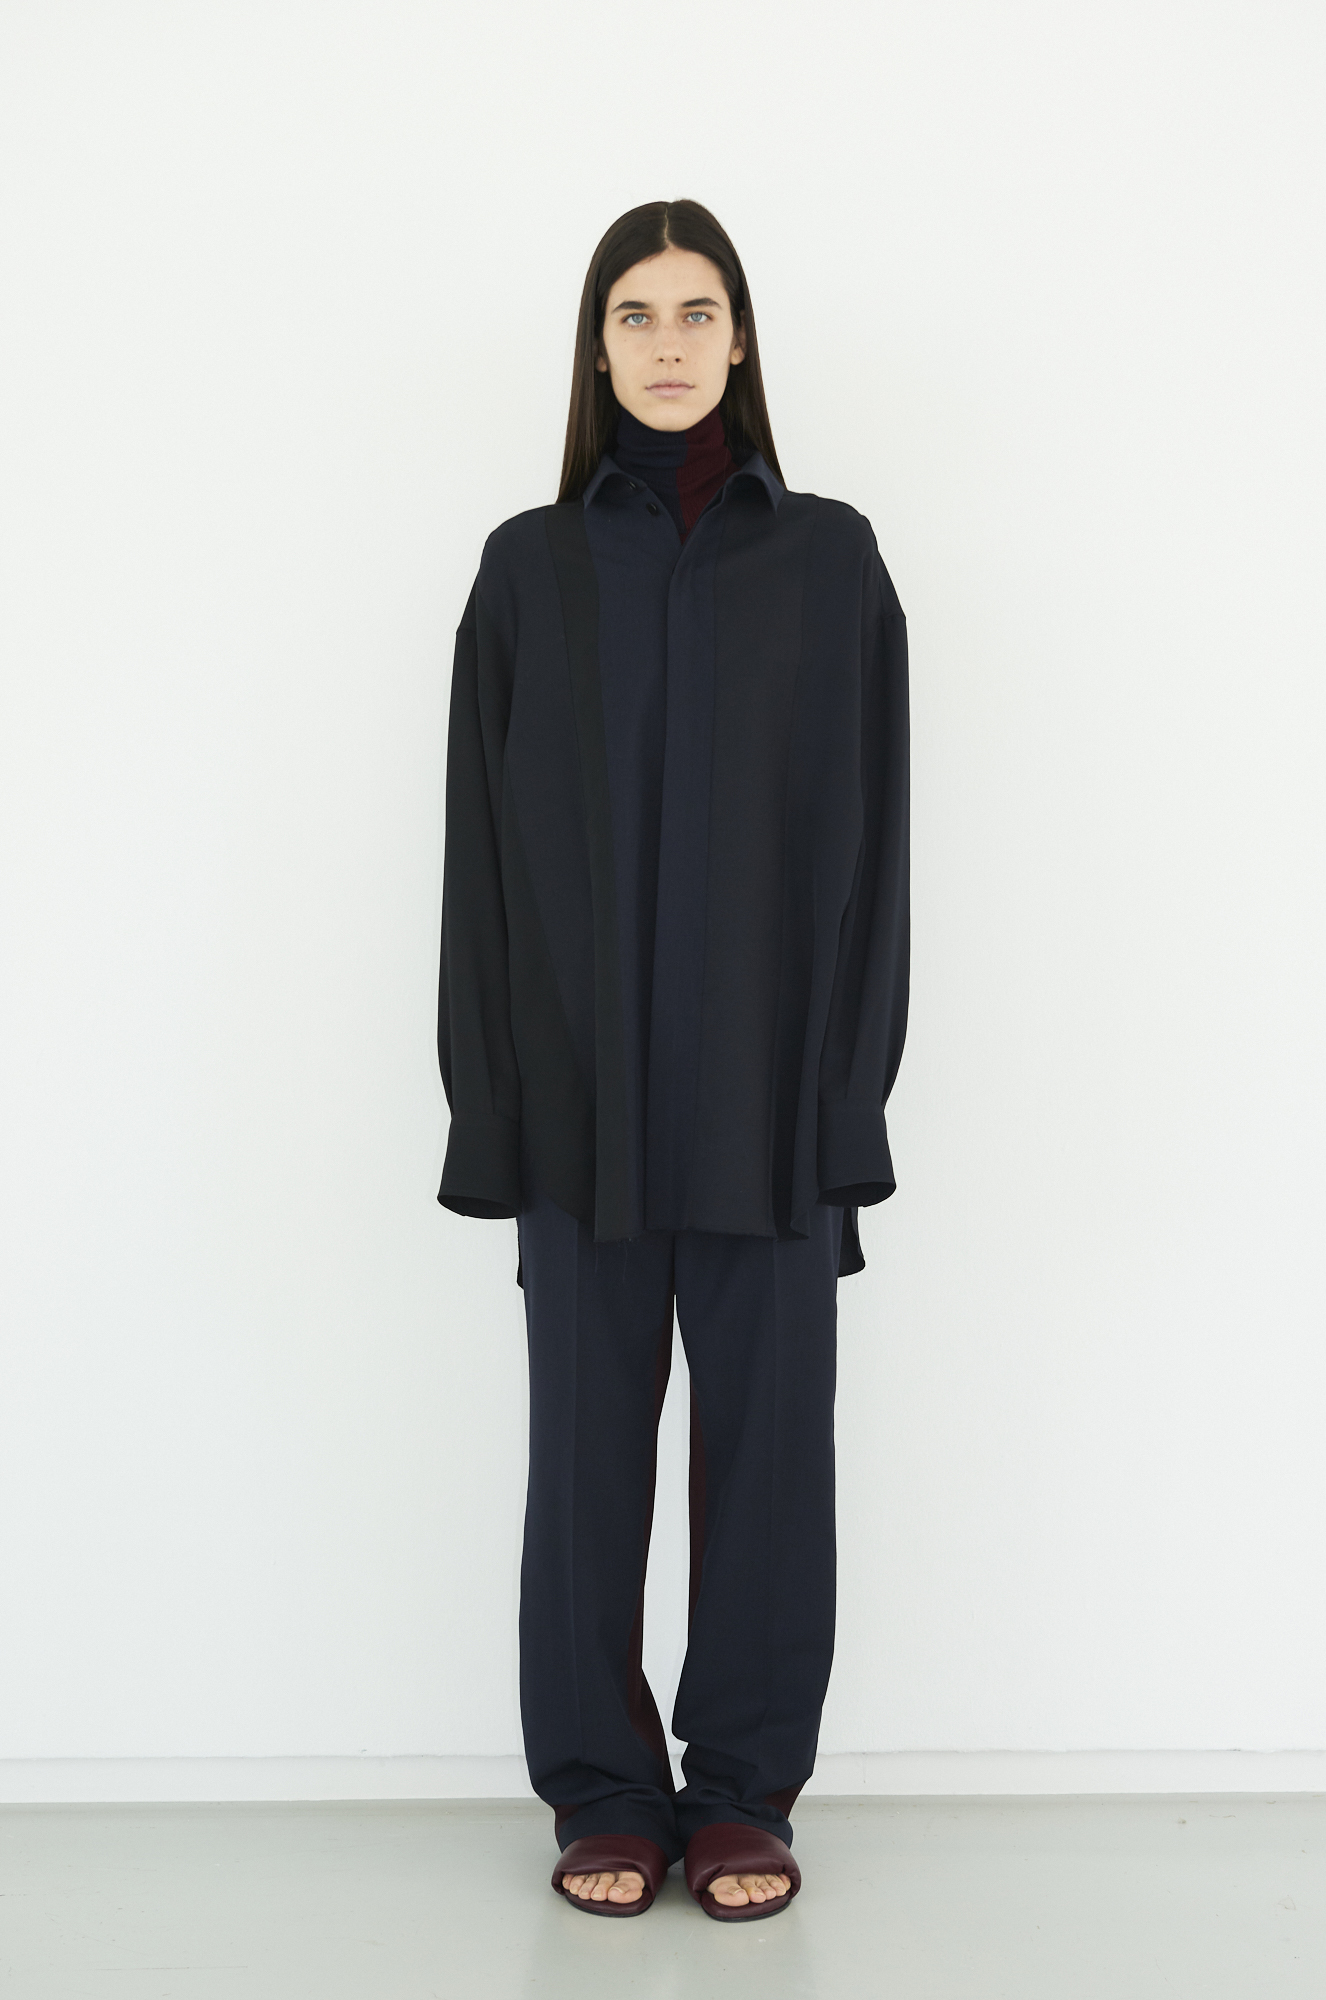 GAUCHERE Fall Winter 2021 Paris Fashion Week LOOK 14 Knit Top TAMER, Shirt THEES, Trousers TOVE, Shoes PILLOW